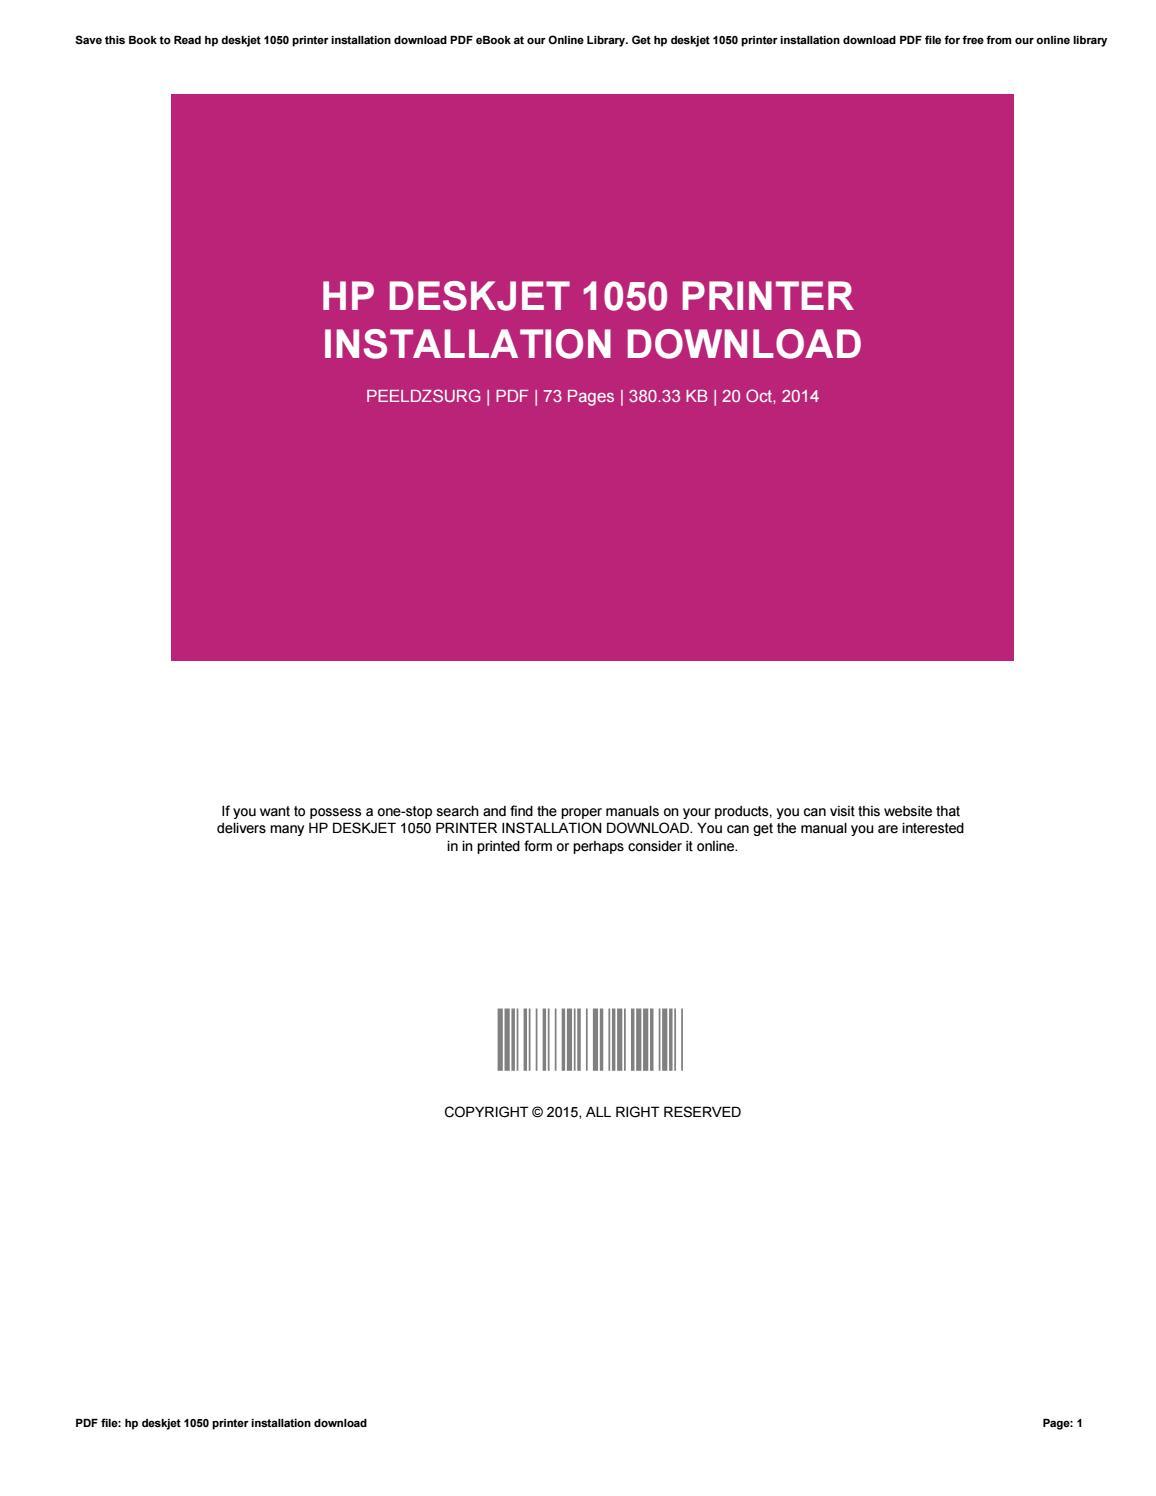 ... Array - hp deskjet 1050 printer installation download by bustari82nava  issuu rh issuu ...